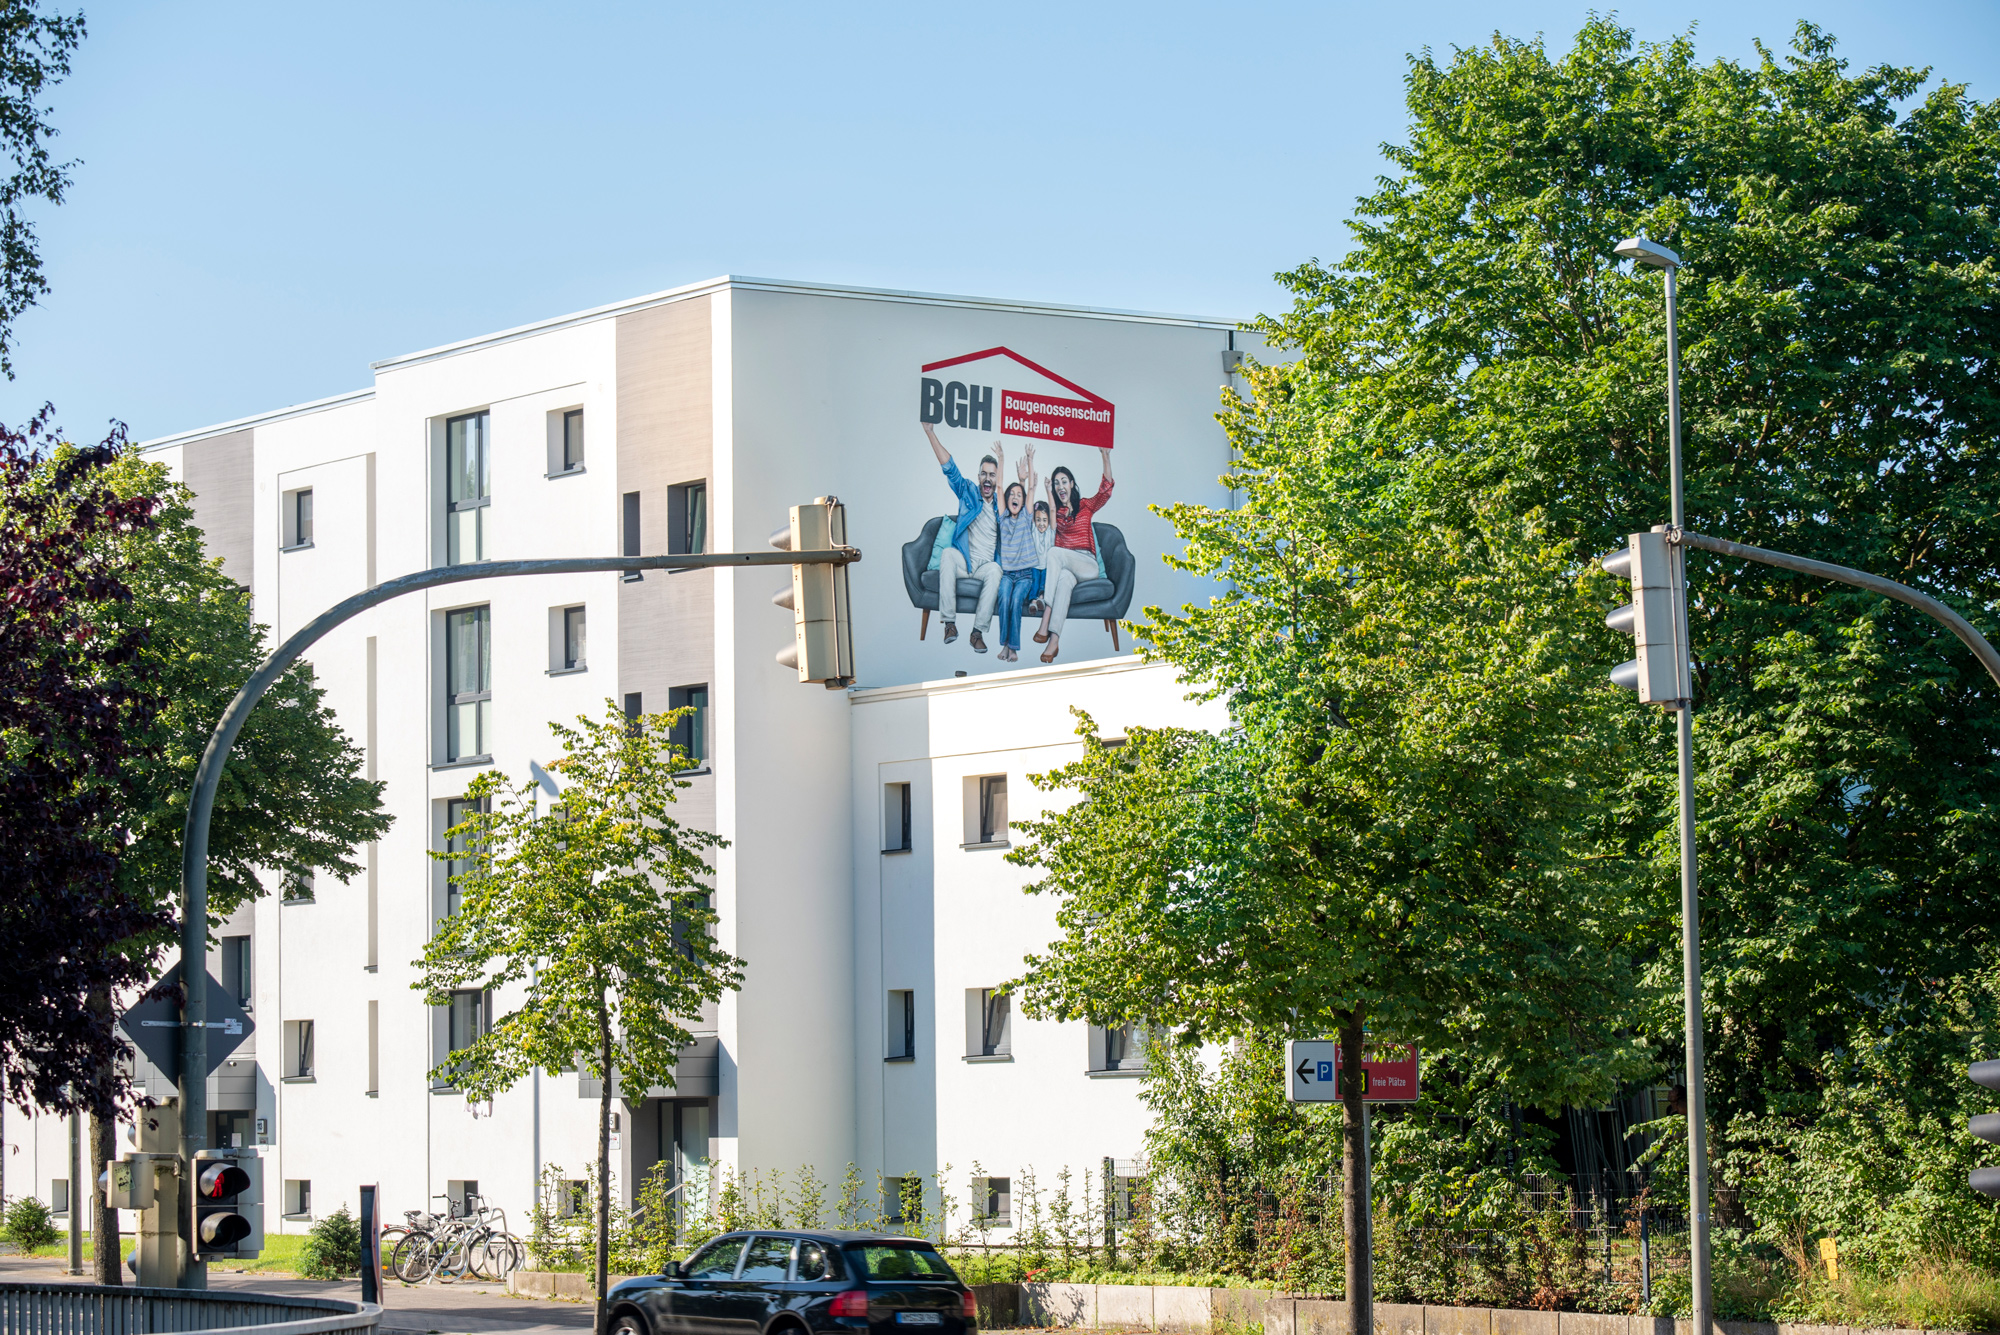 Graffiti Fassadengestaltung BGH Neumünster